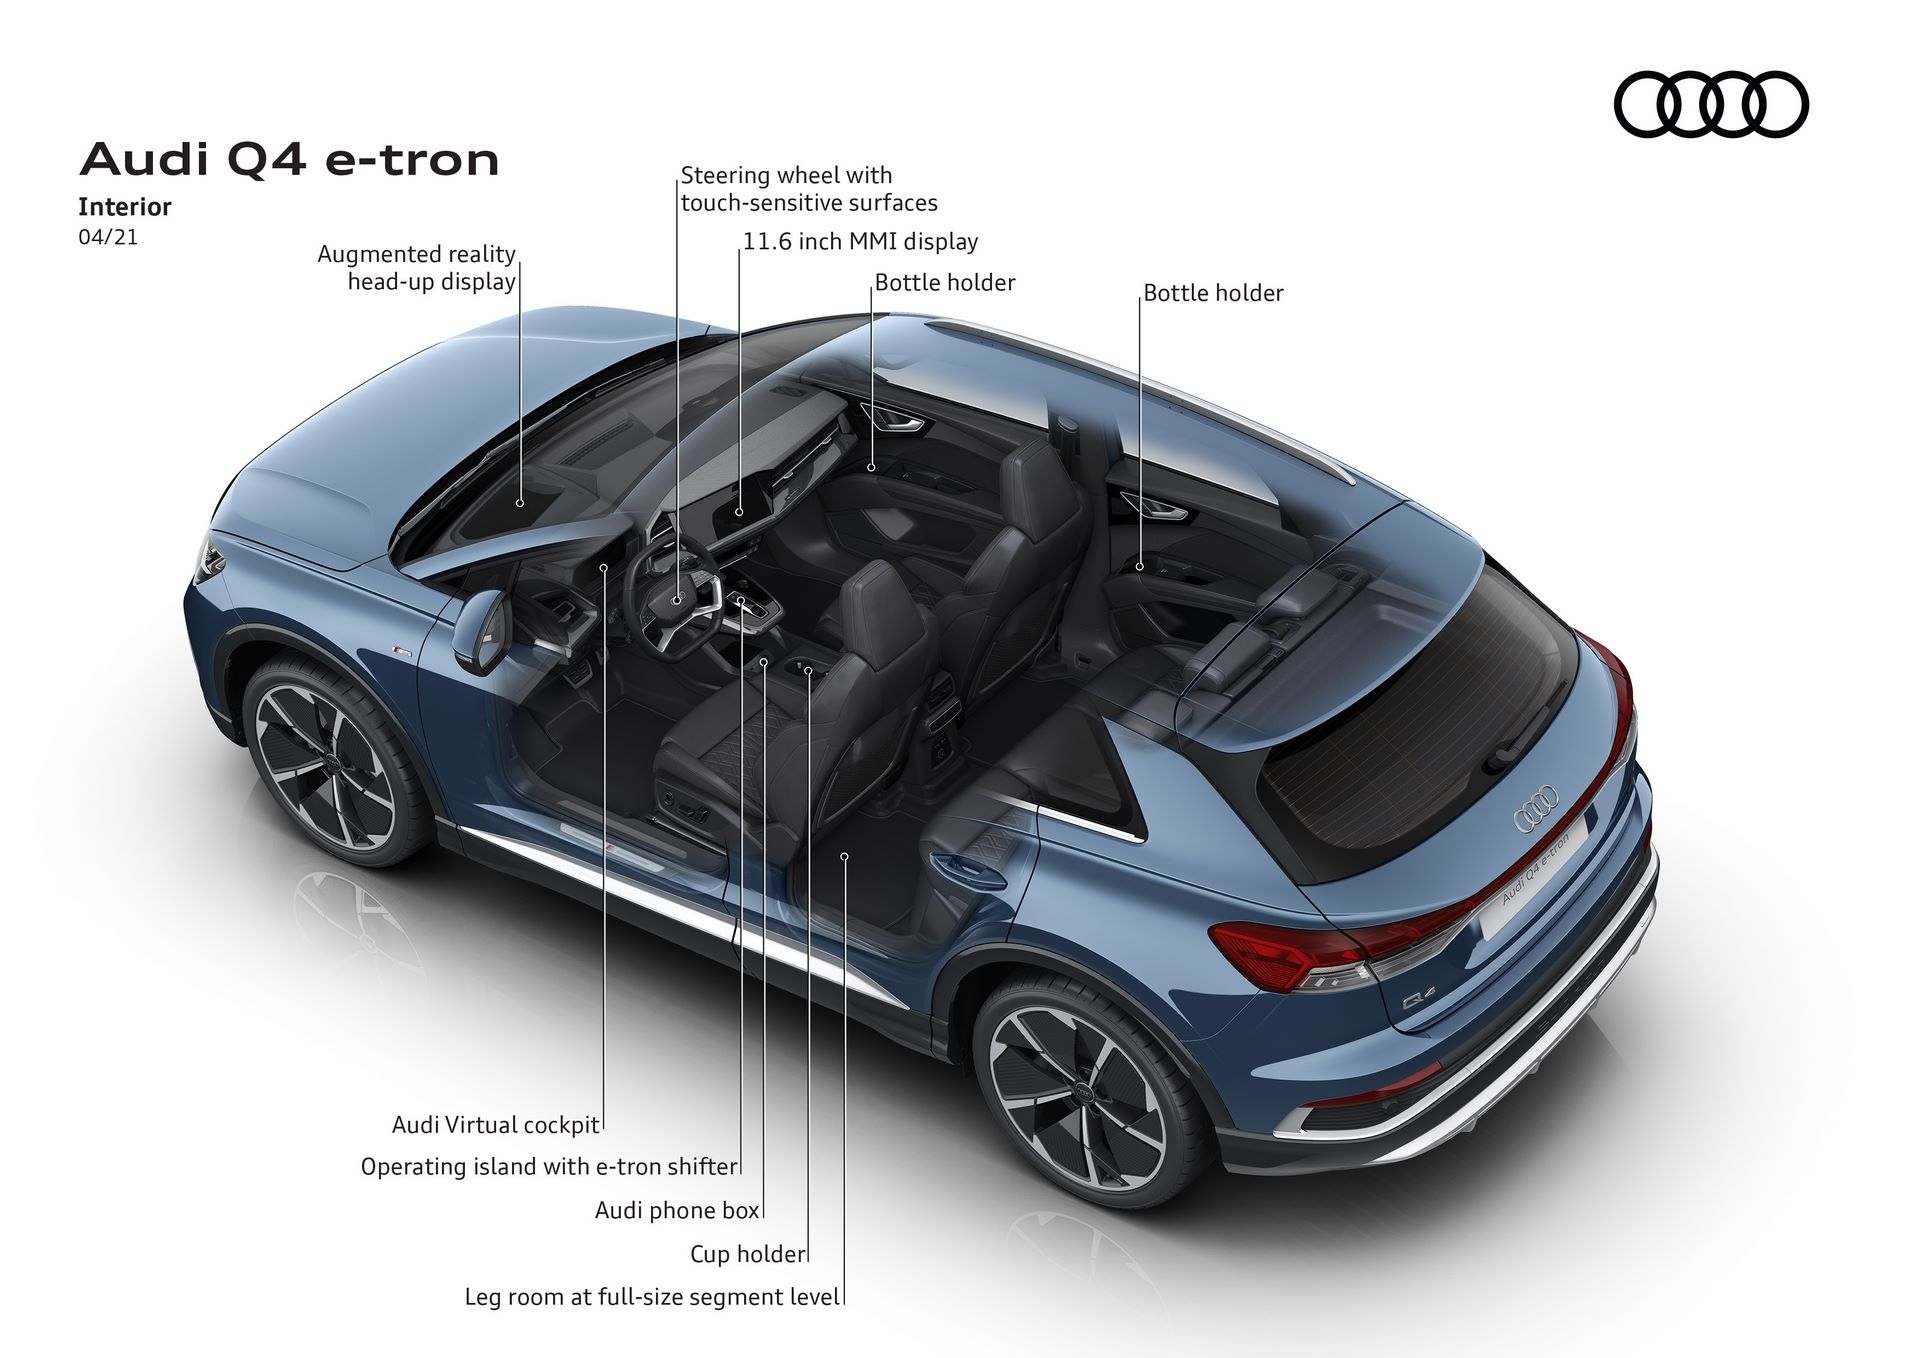 Audi-Q4-e-tron-and-Q4-e-tron-Sportback-103